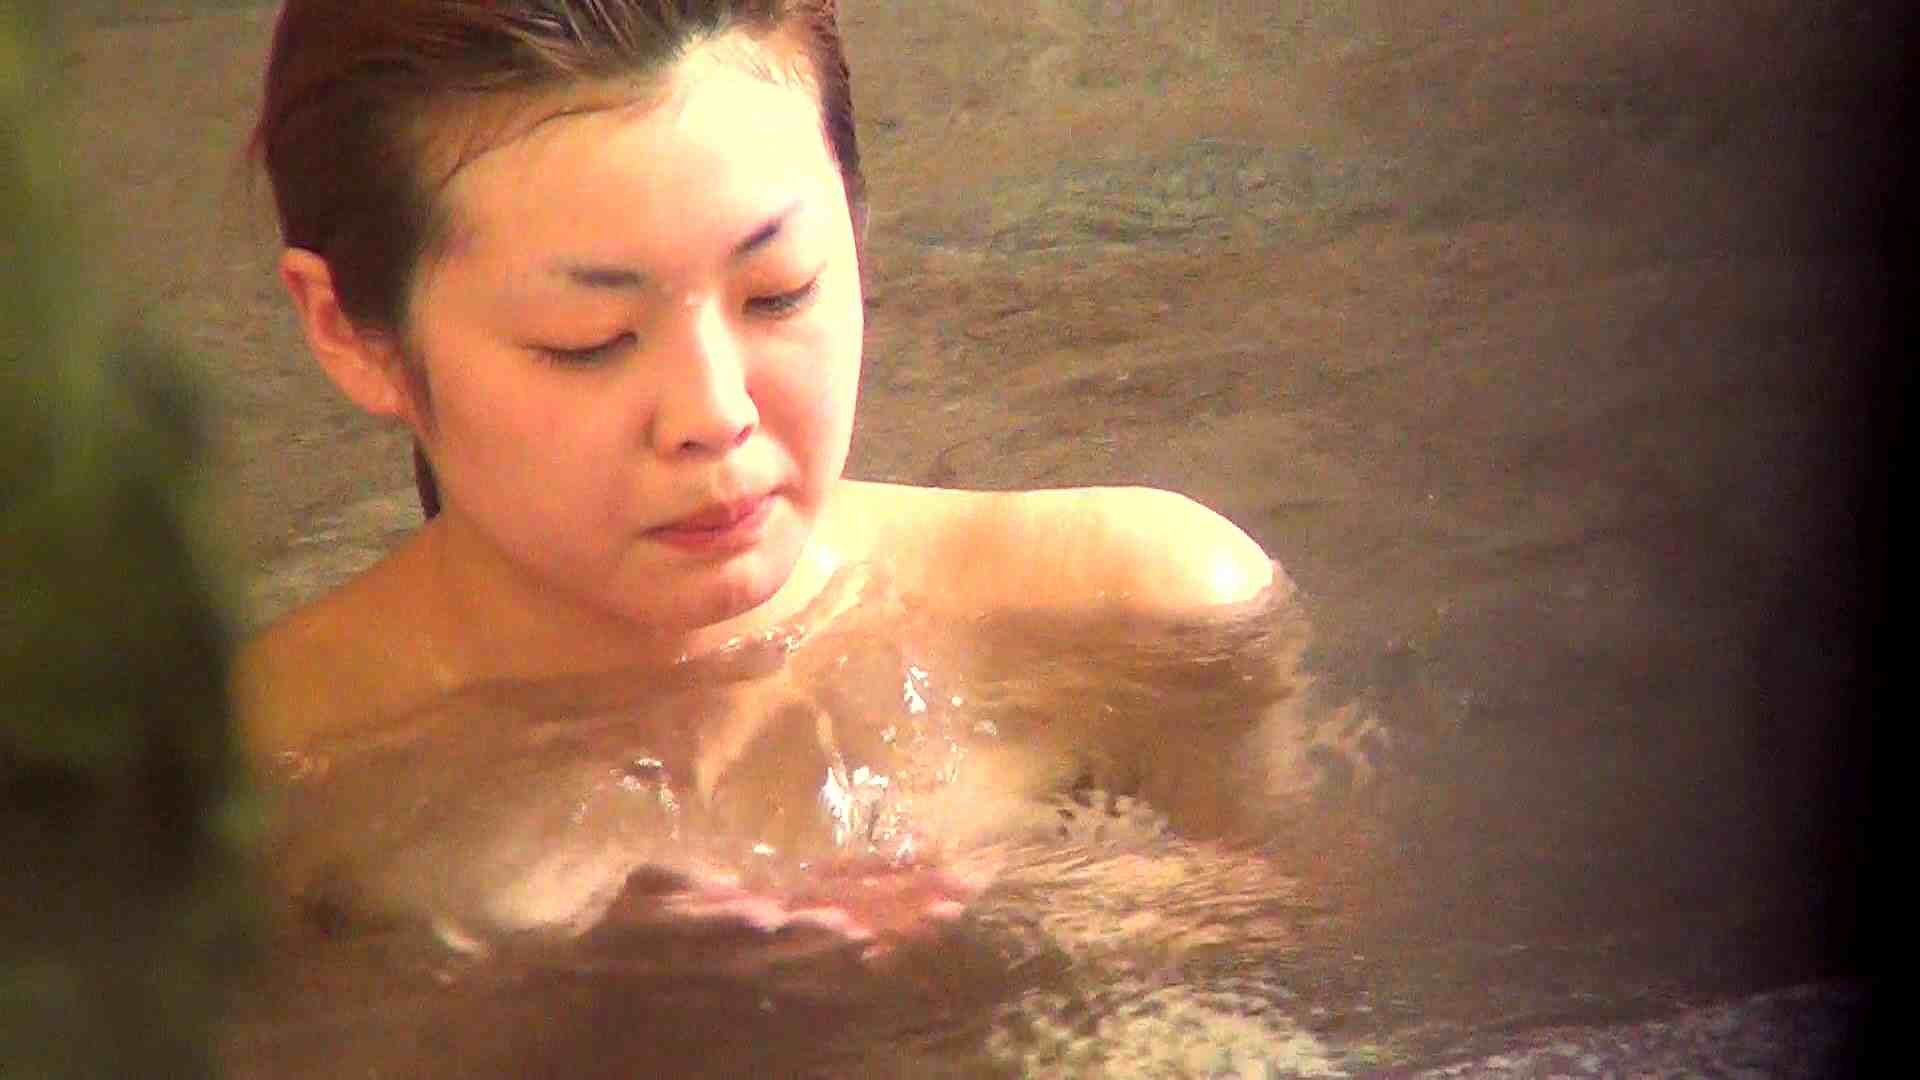 Aquaな露天風呂Vol.288 露天  85連発 74